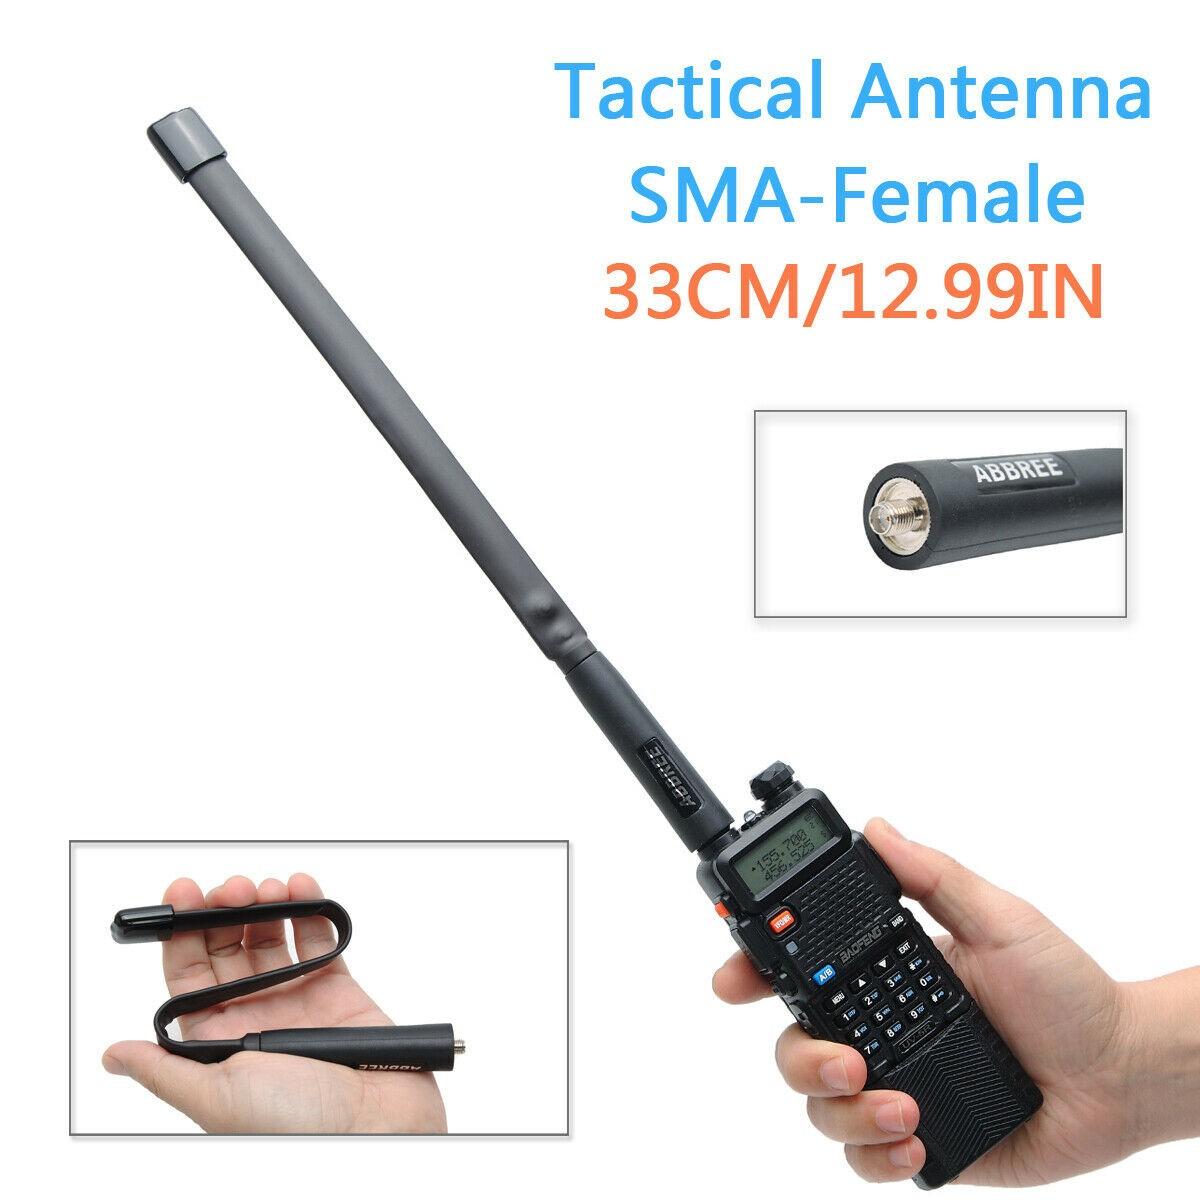 33cm Tactical Antenna SMA-Female Dual Band VHF UHF Foldable For Baofeng Two Way Radio